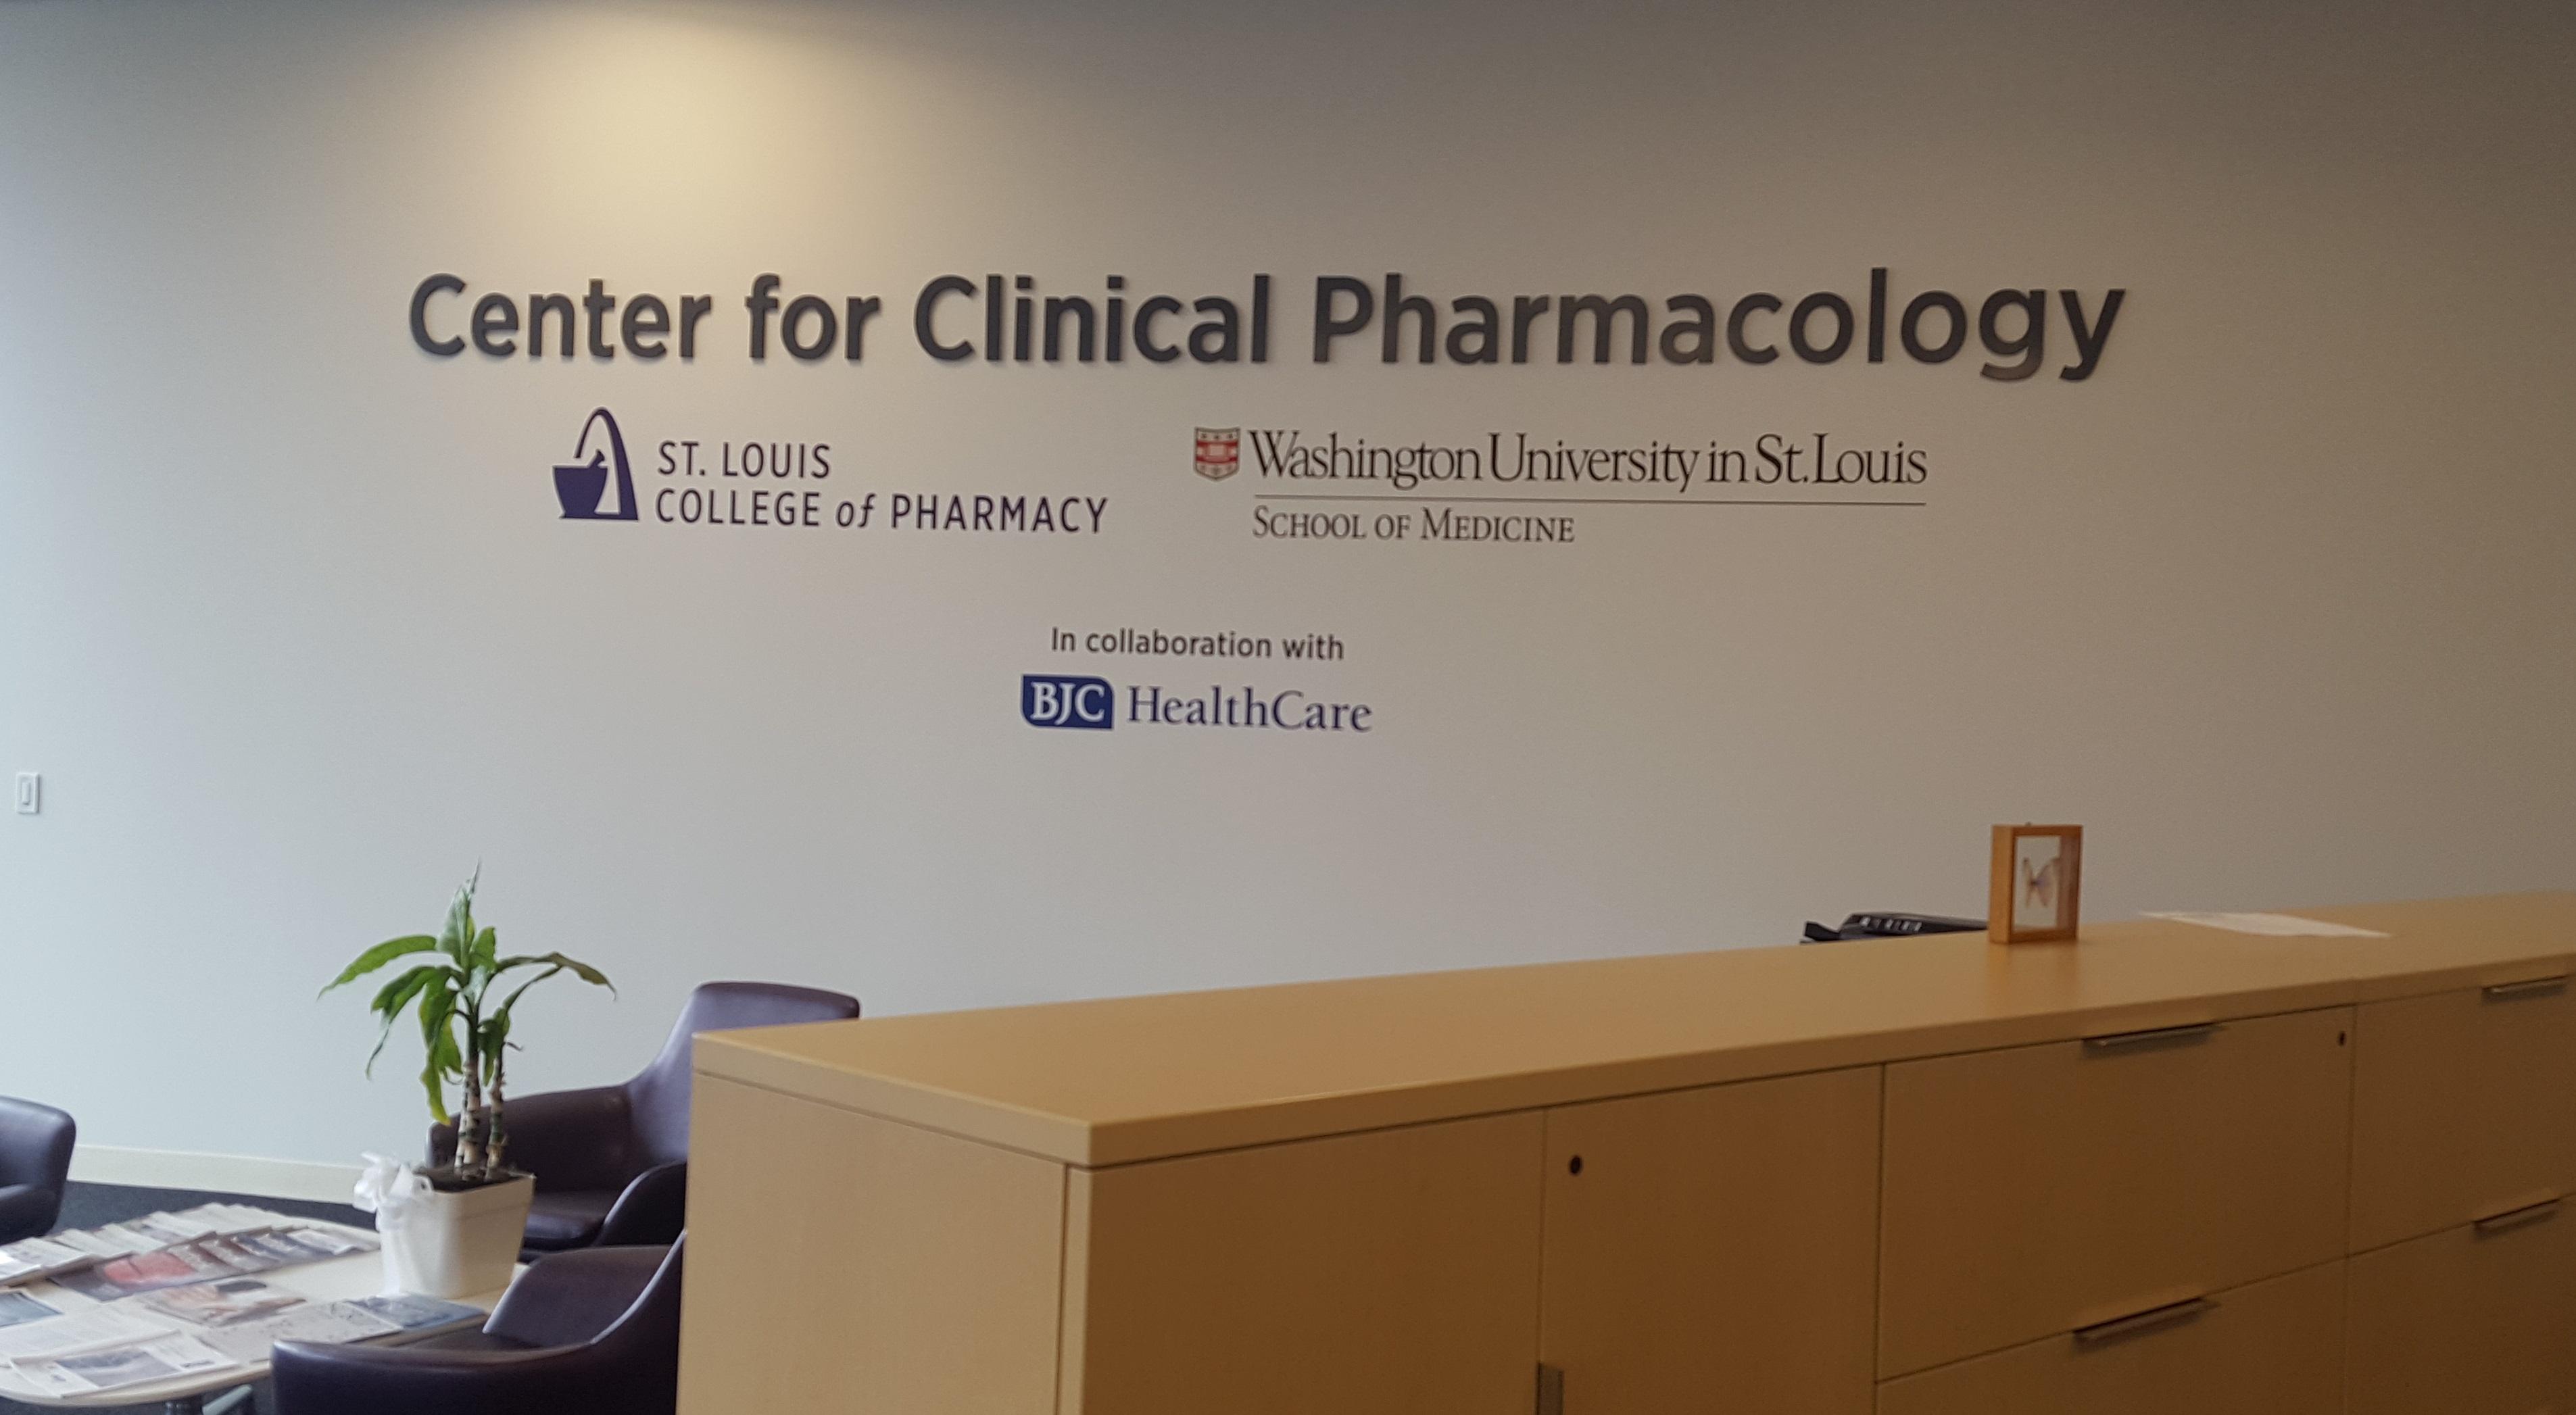 Pharmacy, Medical Schools Create Research Partnership